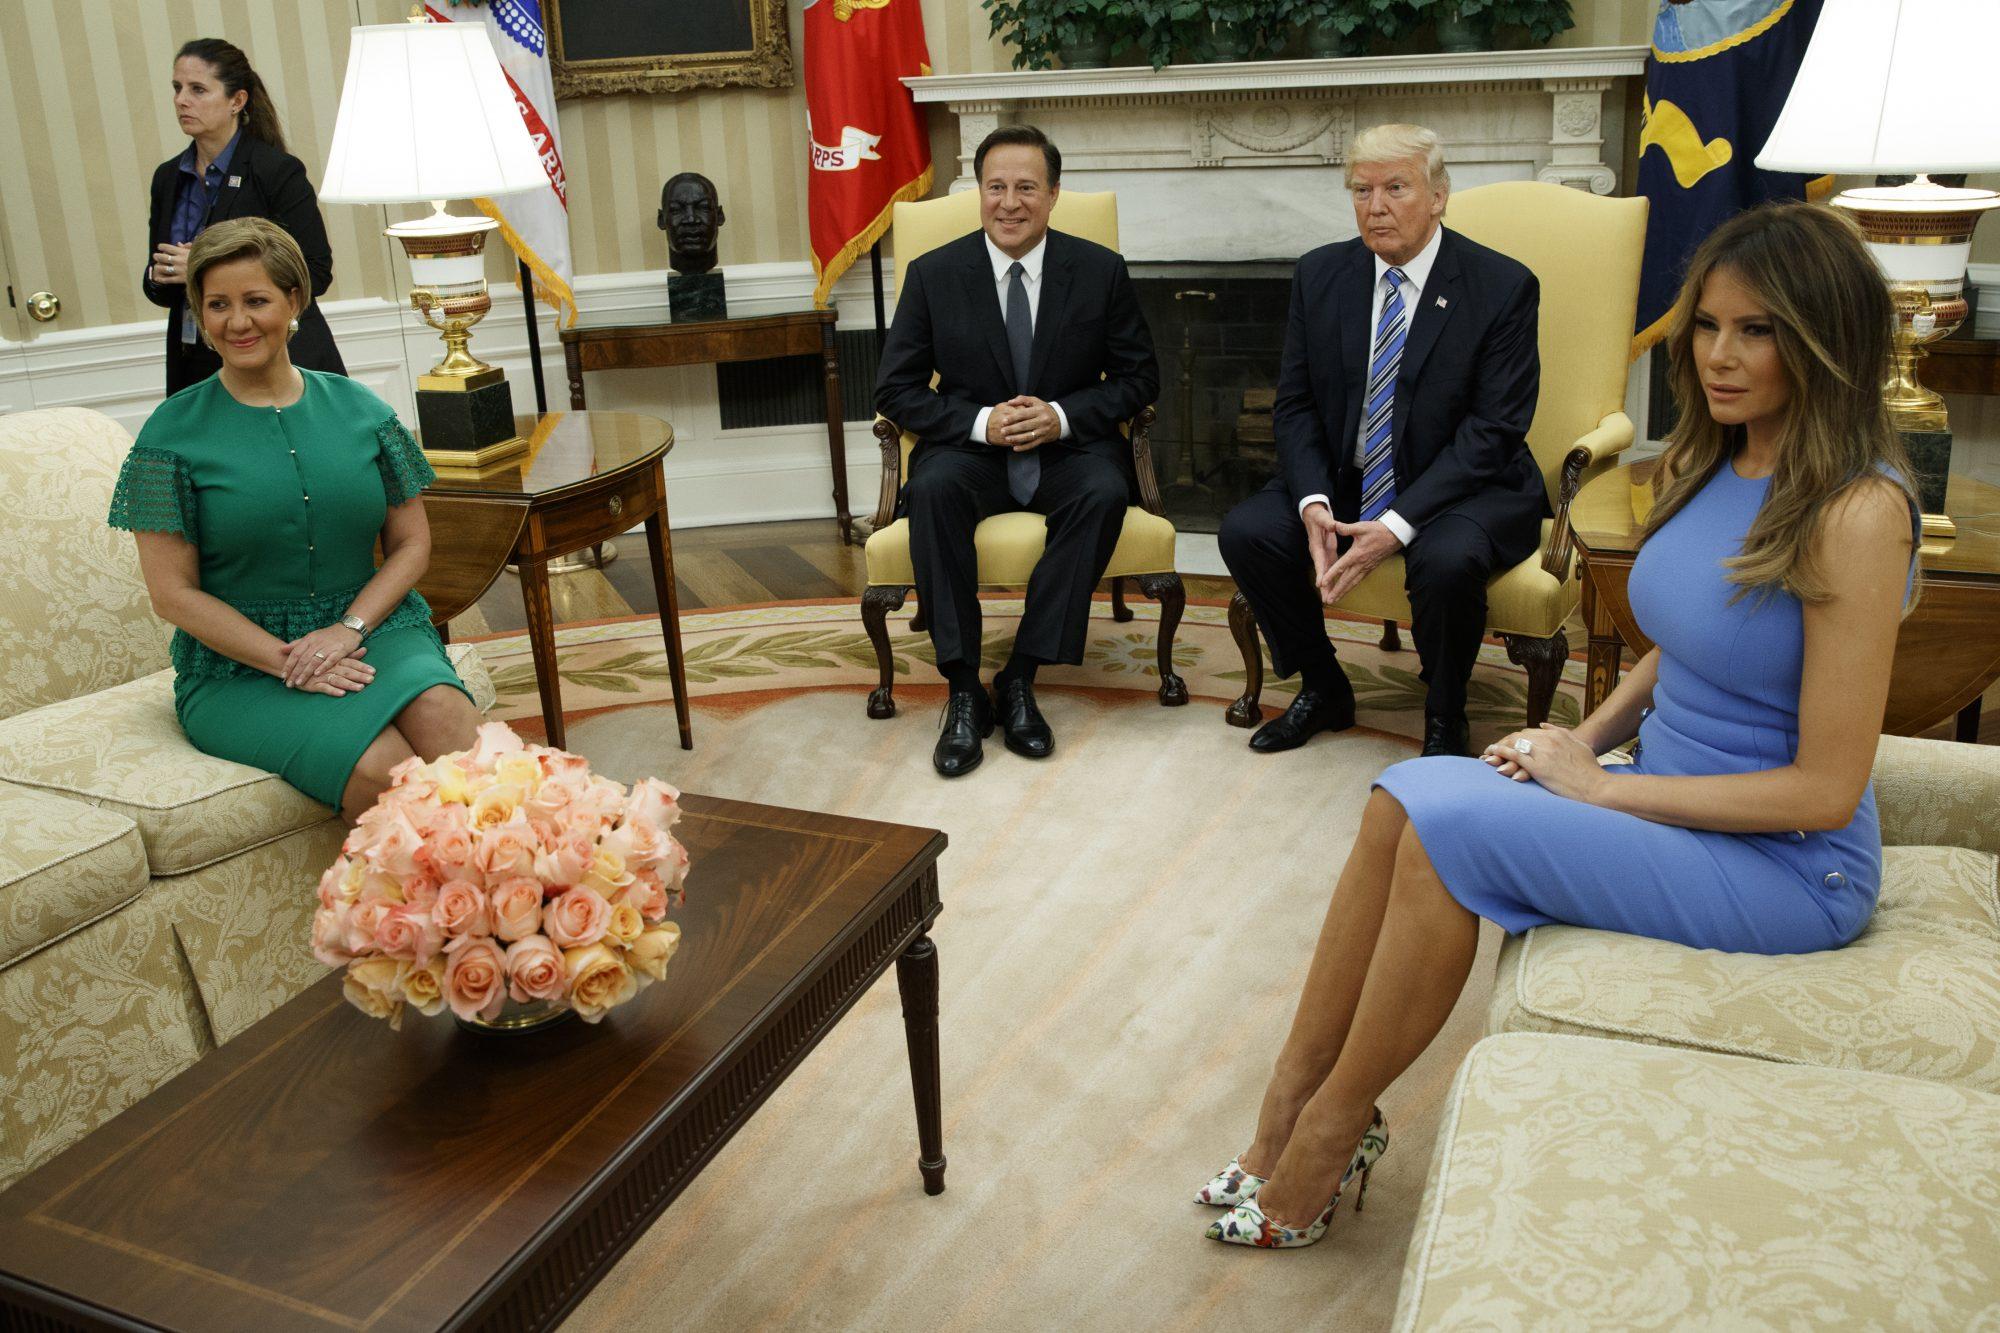 Donald Trump, Juan Carlos Varela, Melania Trump, Lorena Castillo